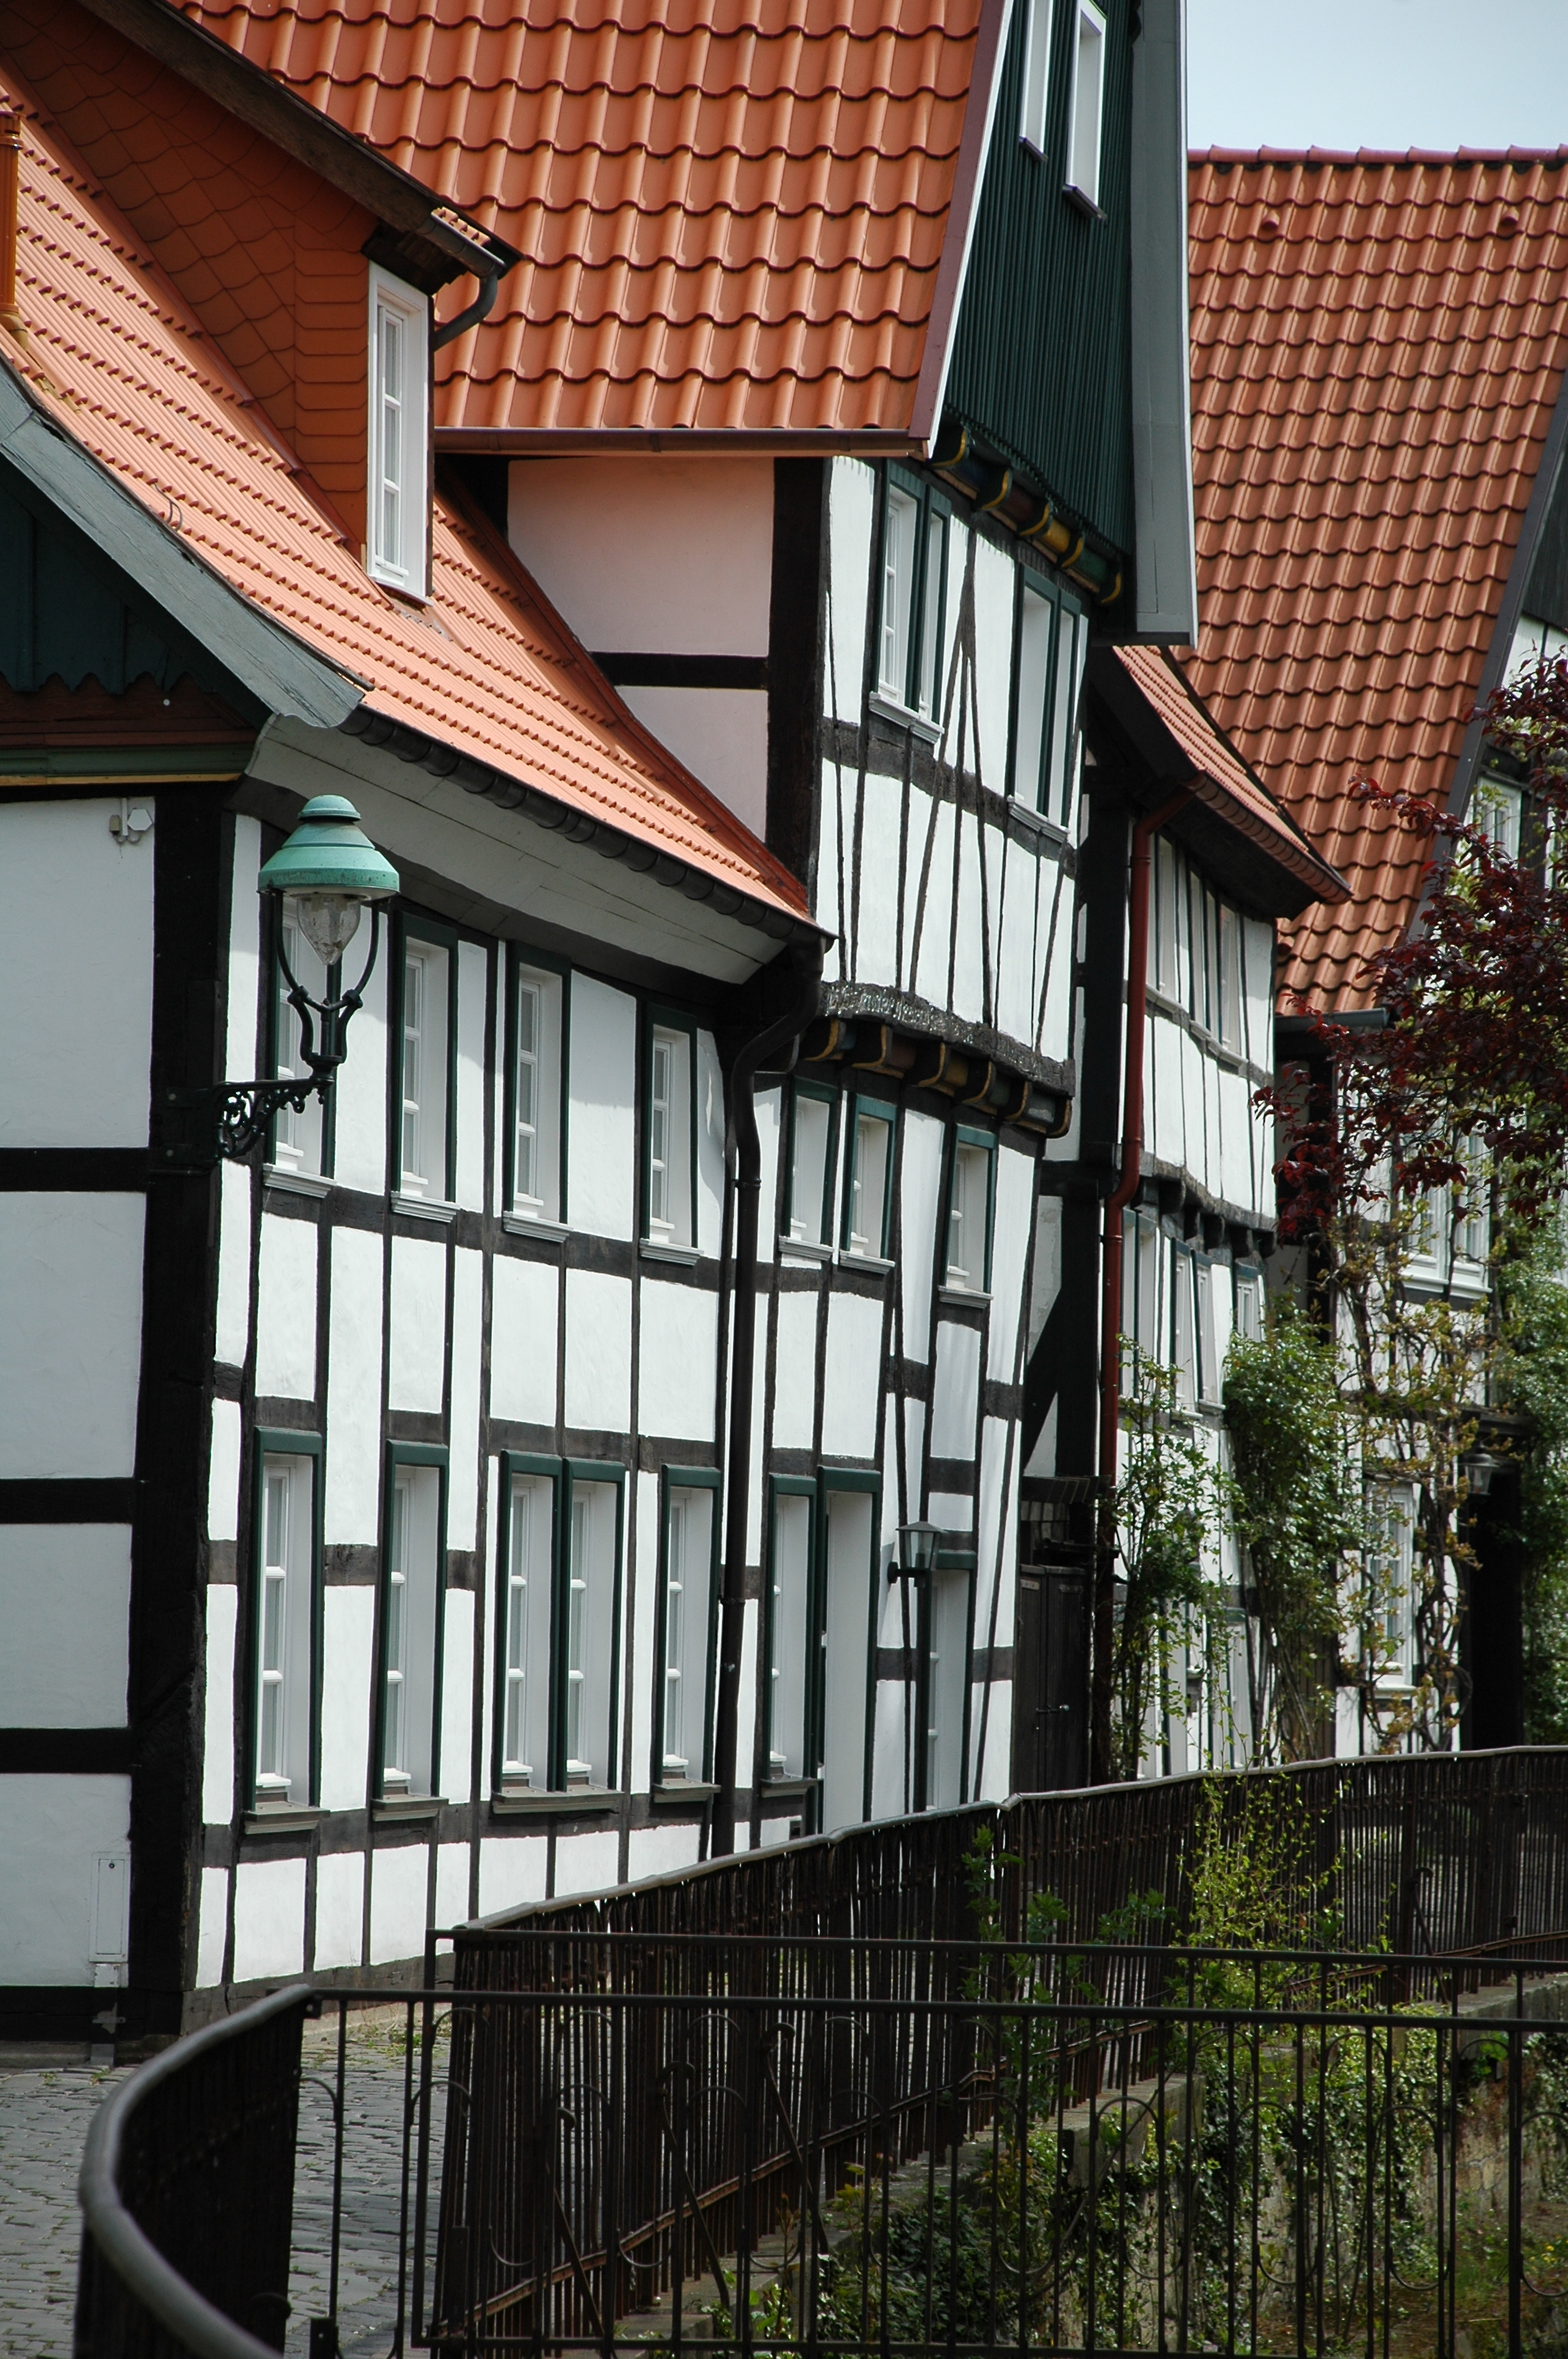 Am Loerbach in Soest - © Werner Tigges